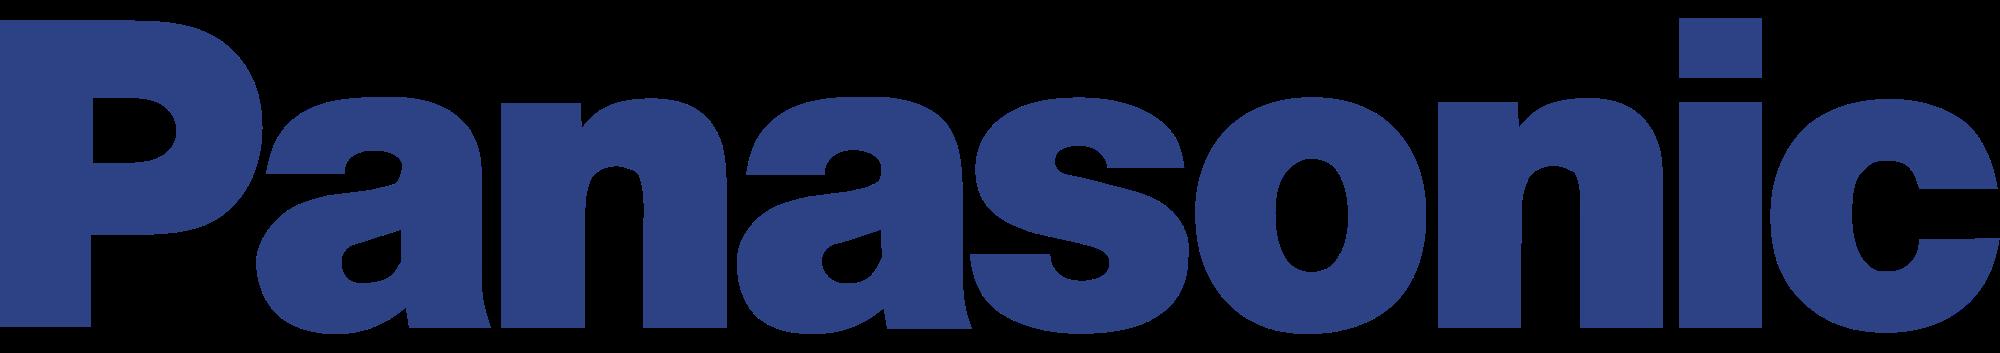 Panasonic-Logo-svg.png